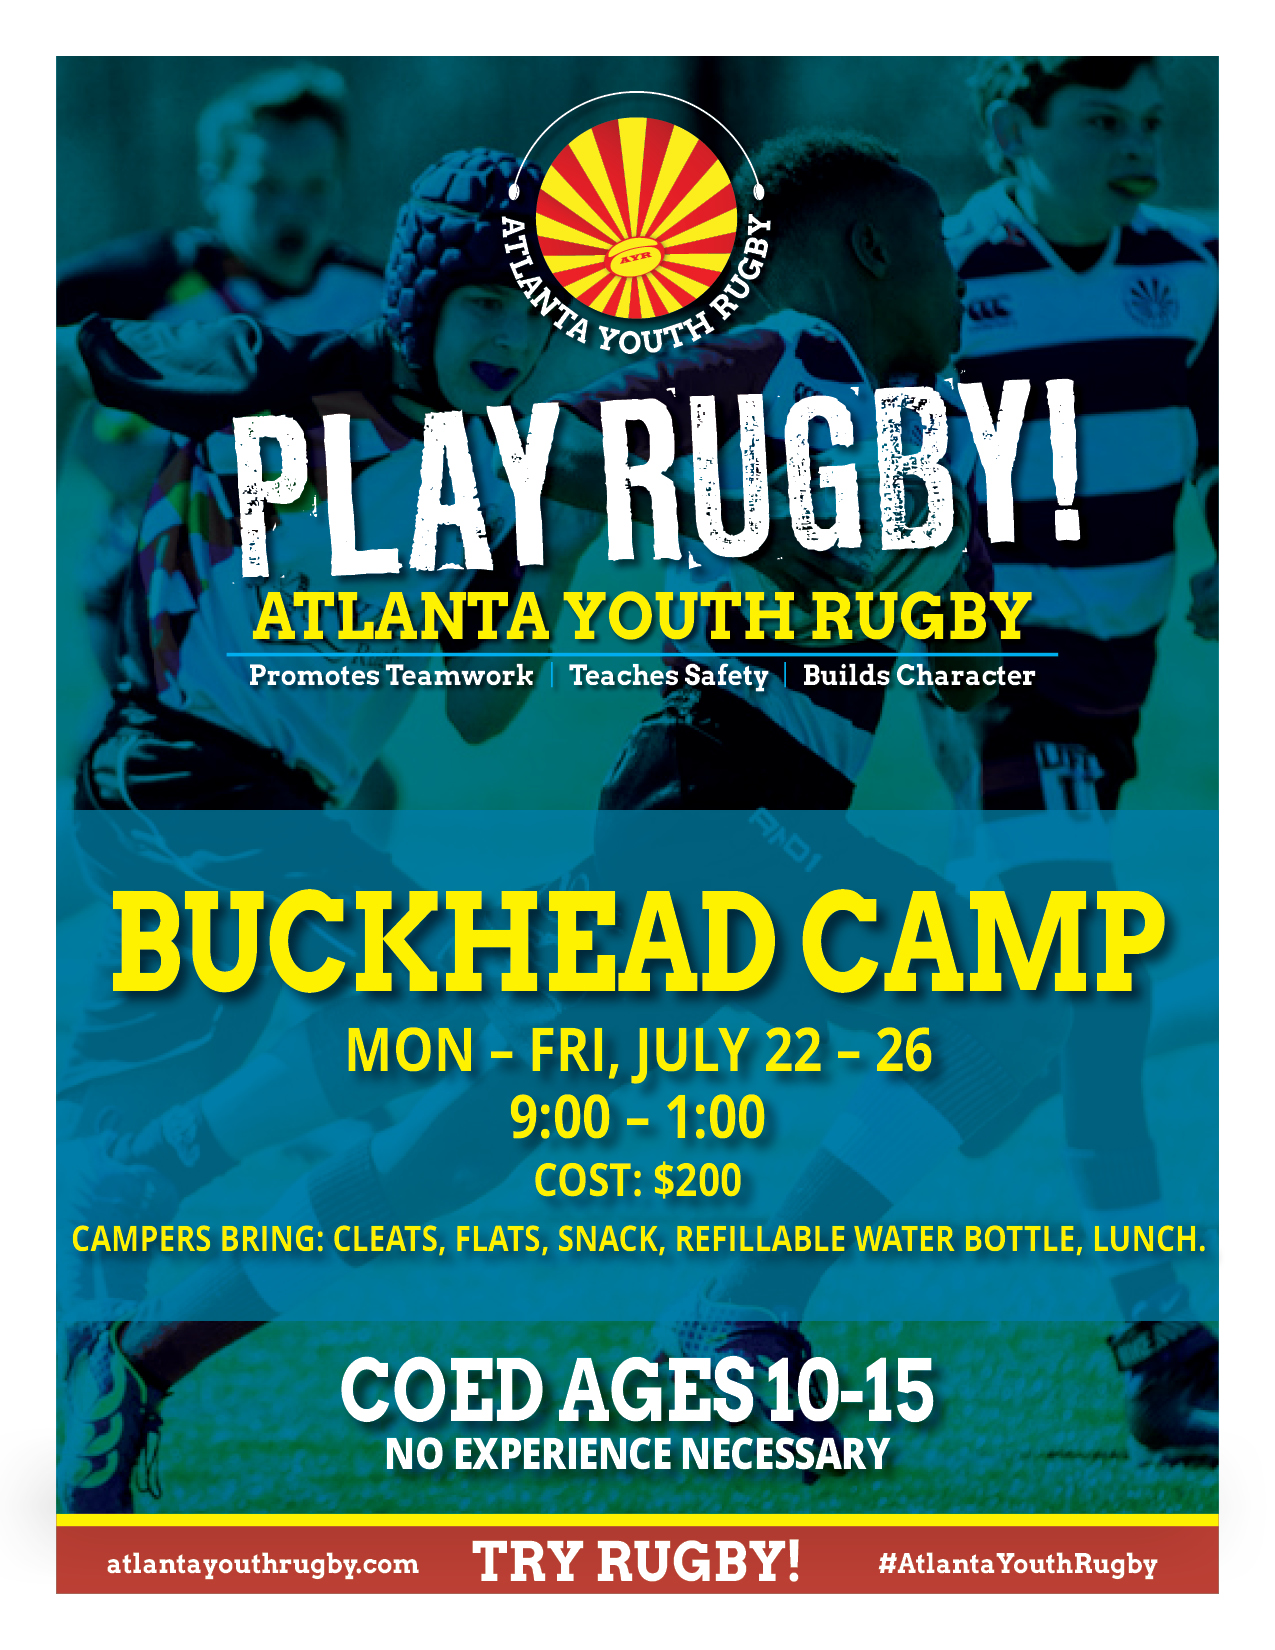 Rugby email flyer_ATLANTA_2019_camp_8.5x11_buckhead.jpg